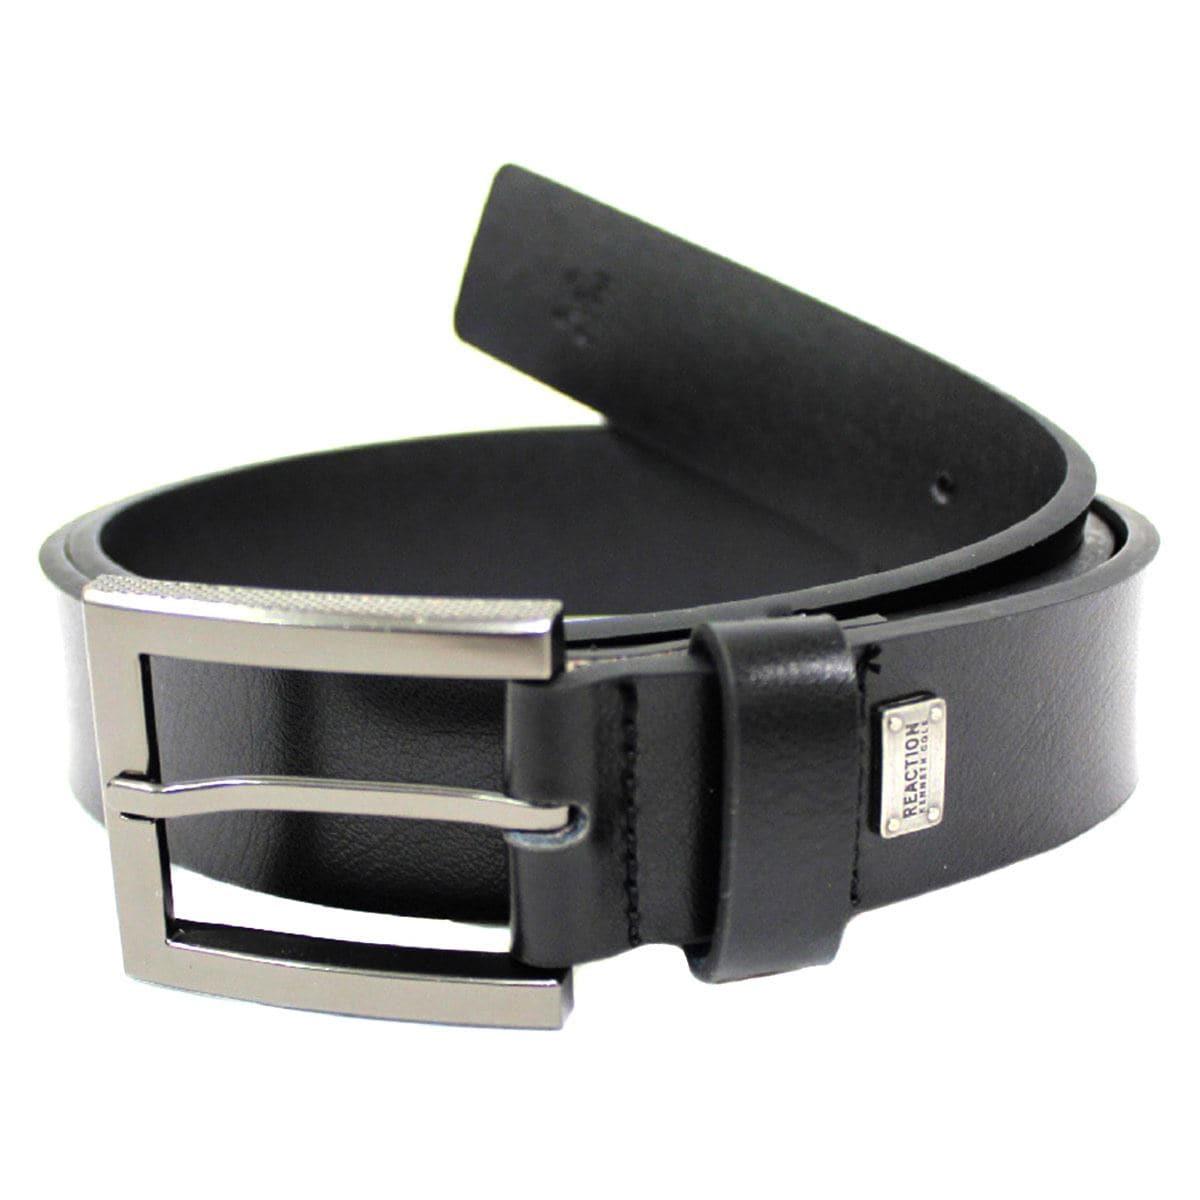 Cinturón T 38-40  Negro K11-5003-1c Kenneth Cole